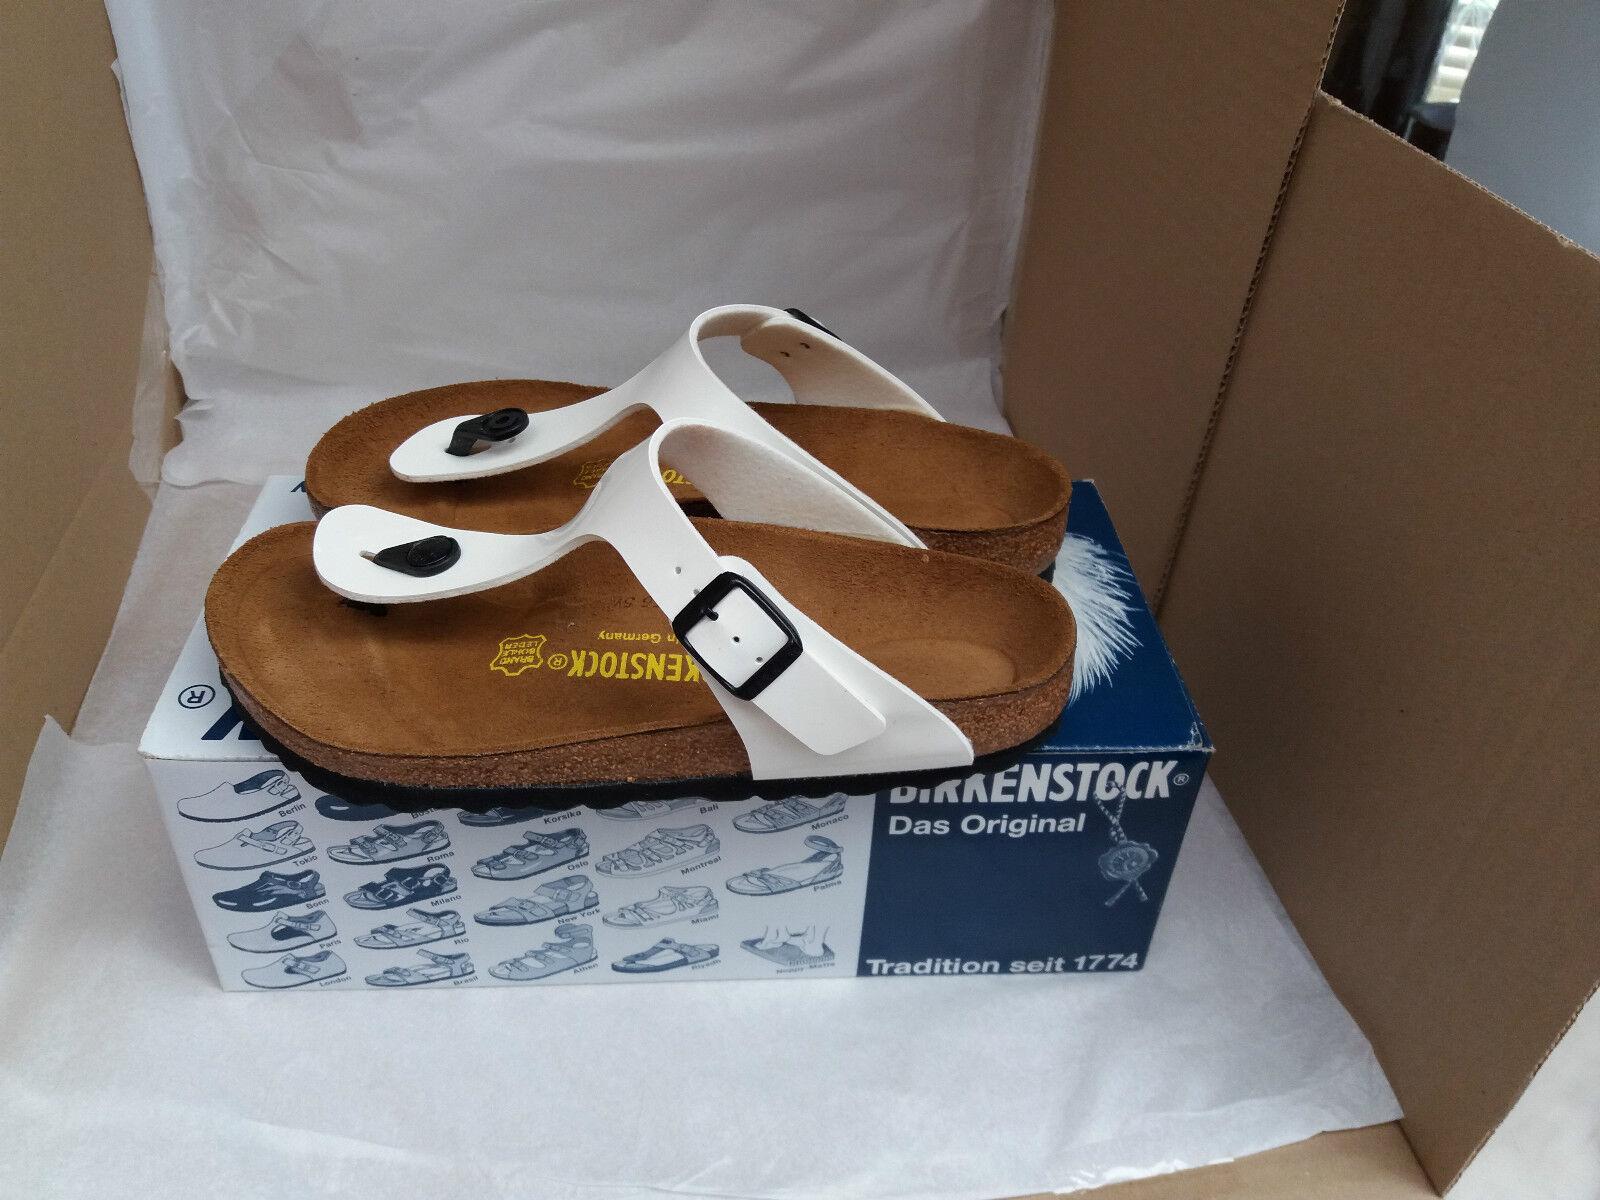 New Birkenstock Gizeh WEISS Thong Sandale UK Größe 4.5 EU 37